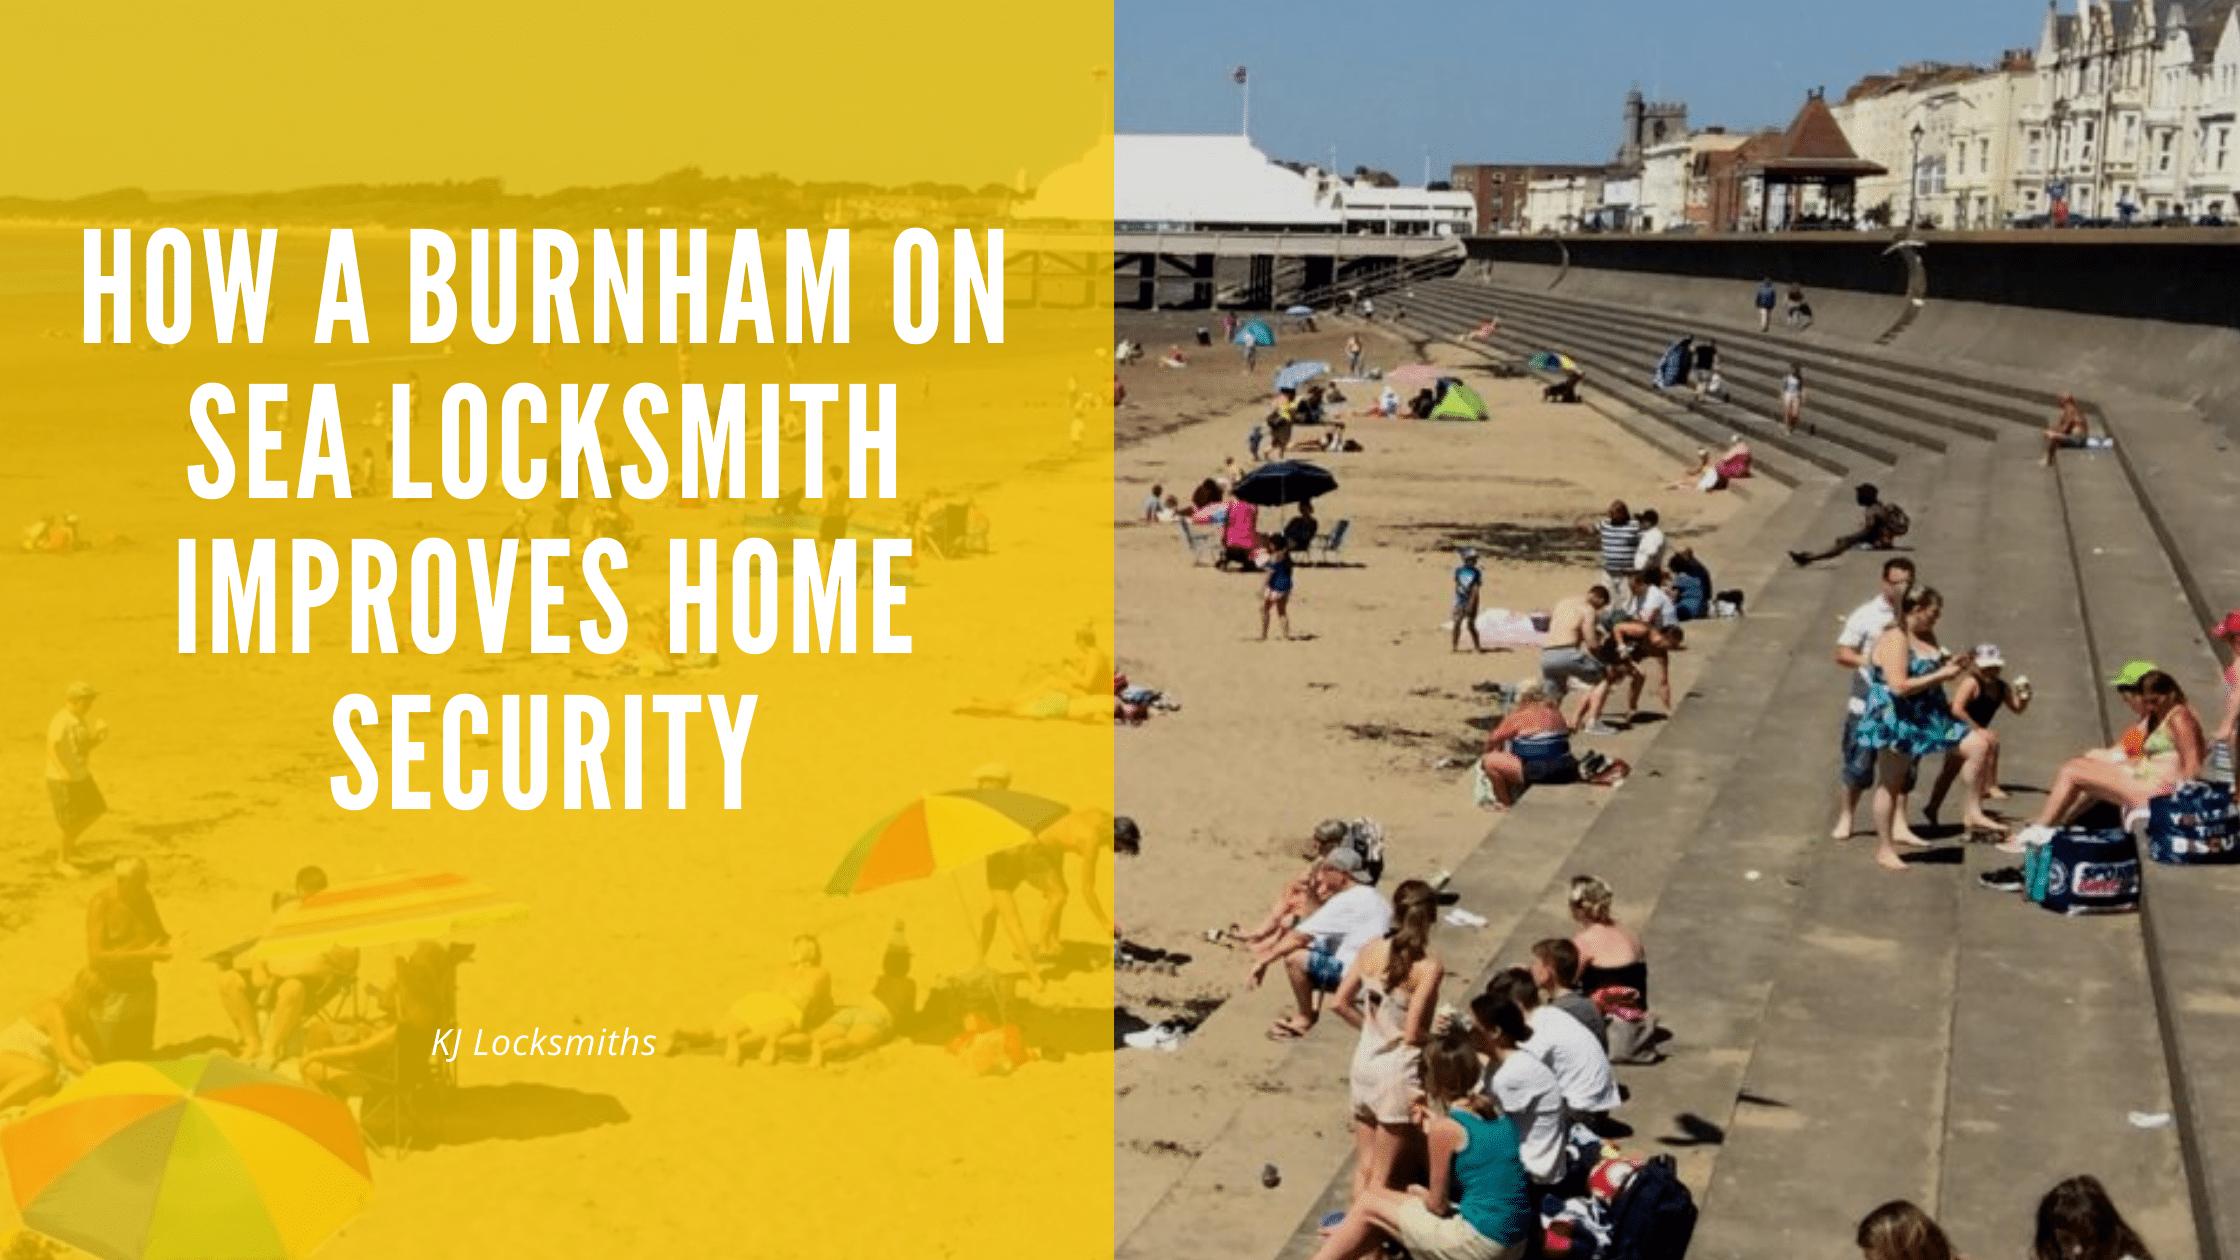 How A Burnham-on-Sea locksmith Improves Home Security